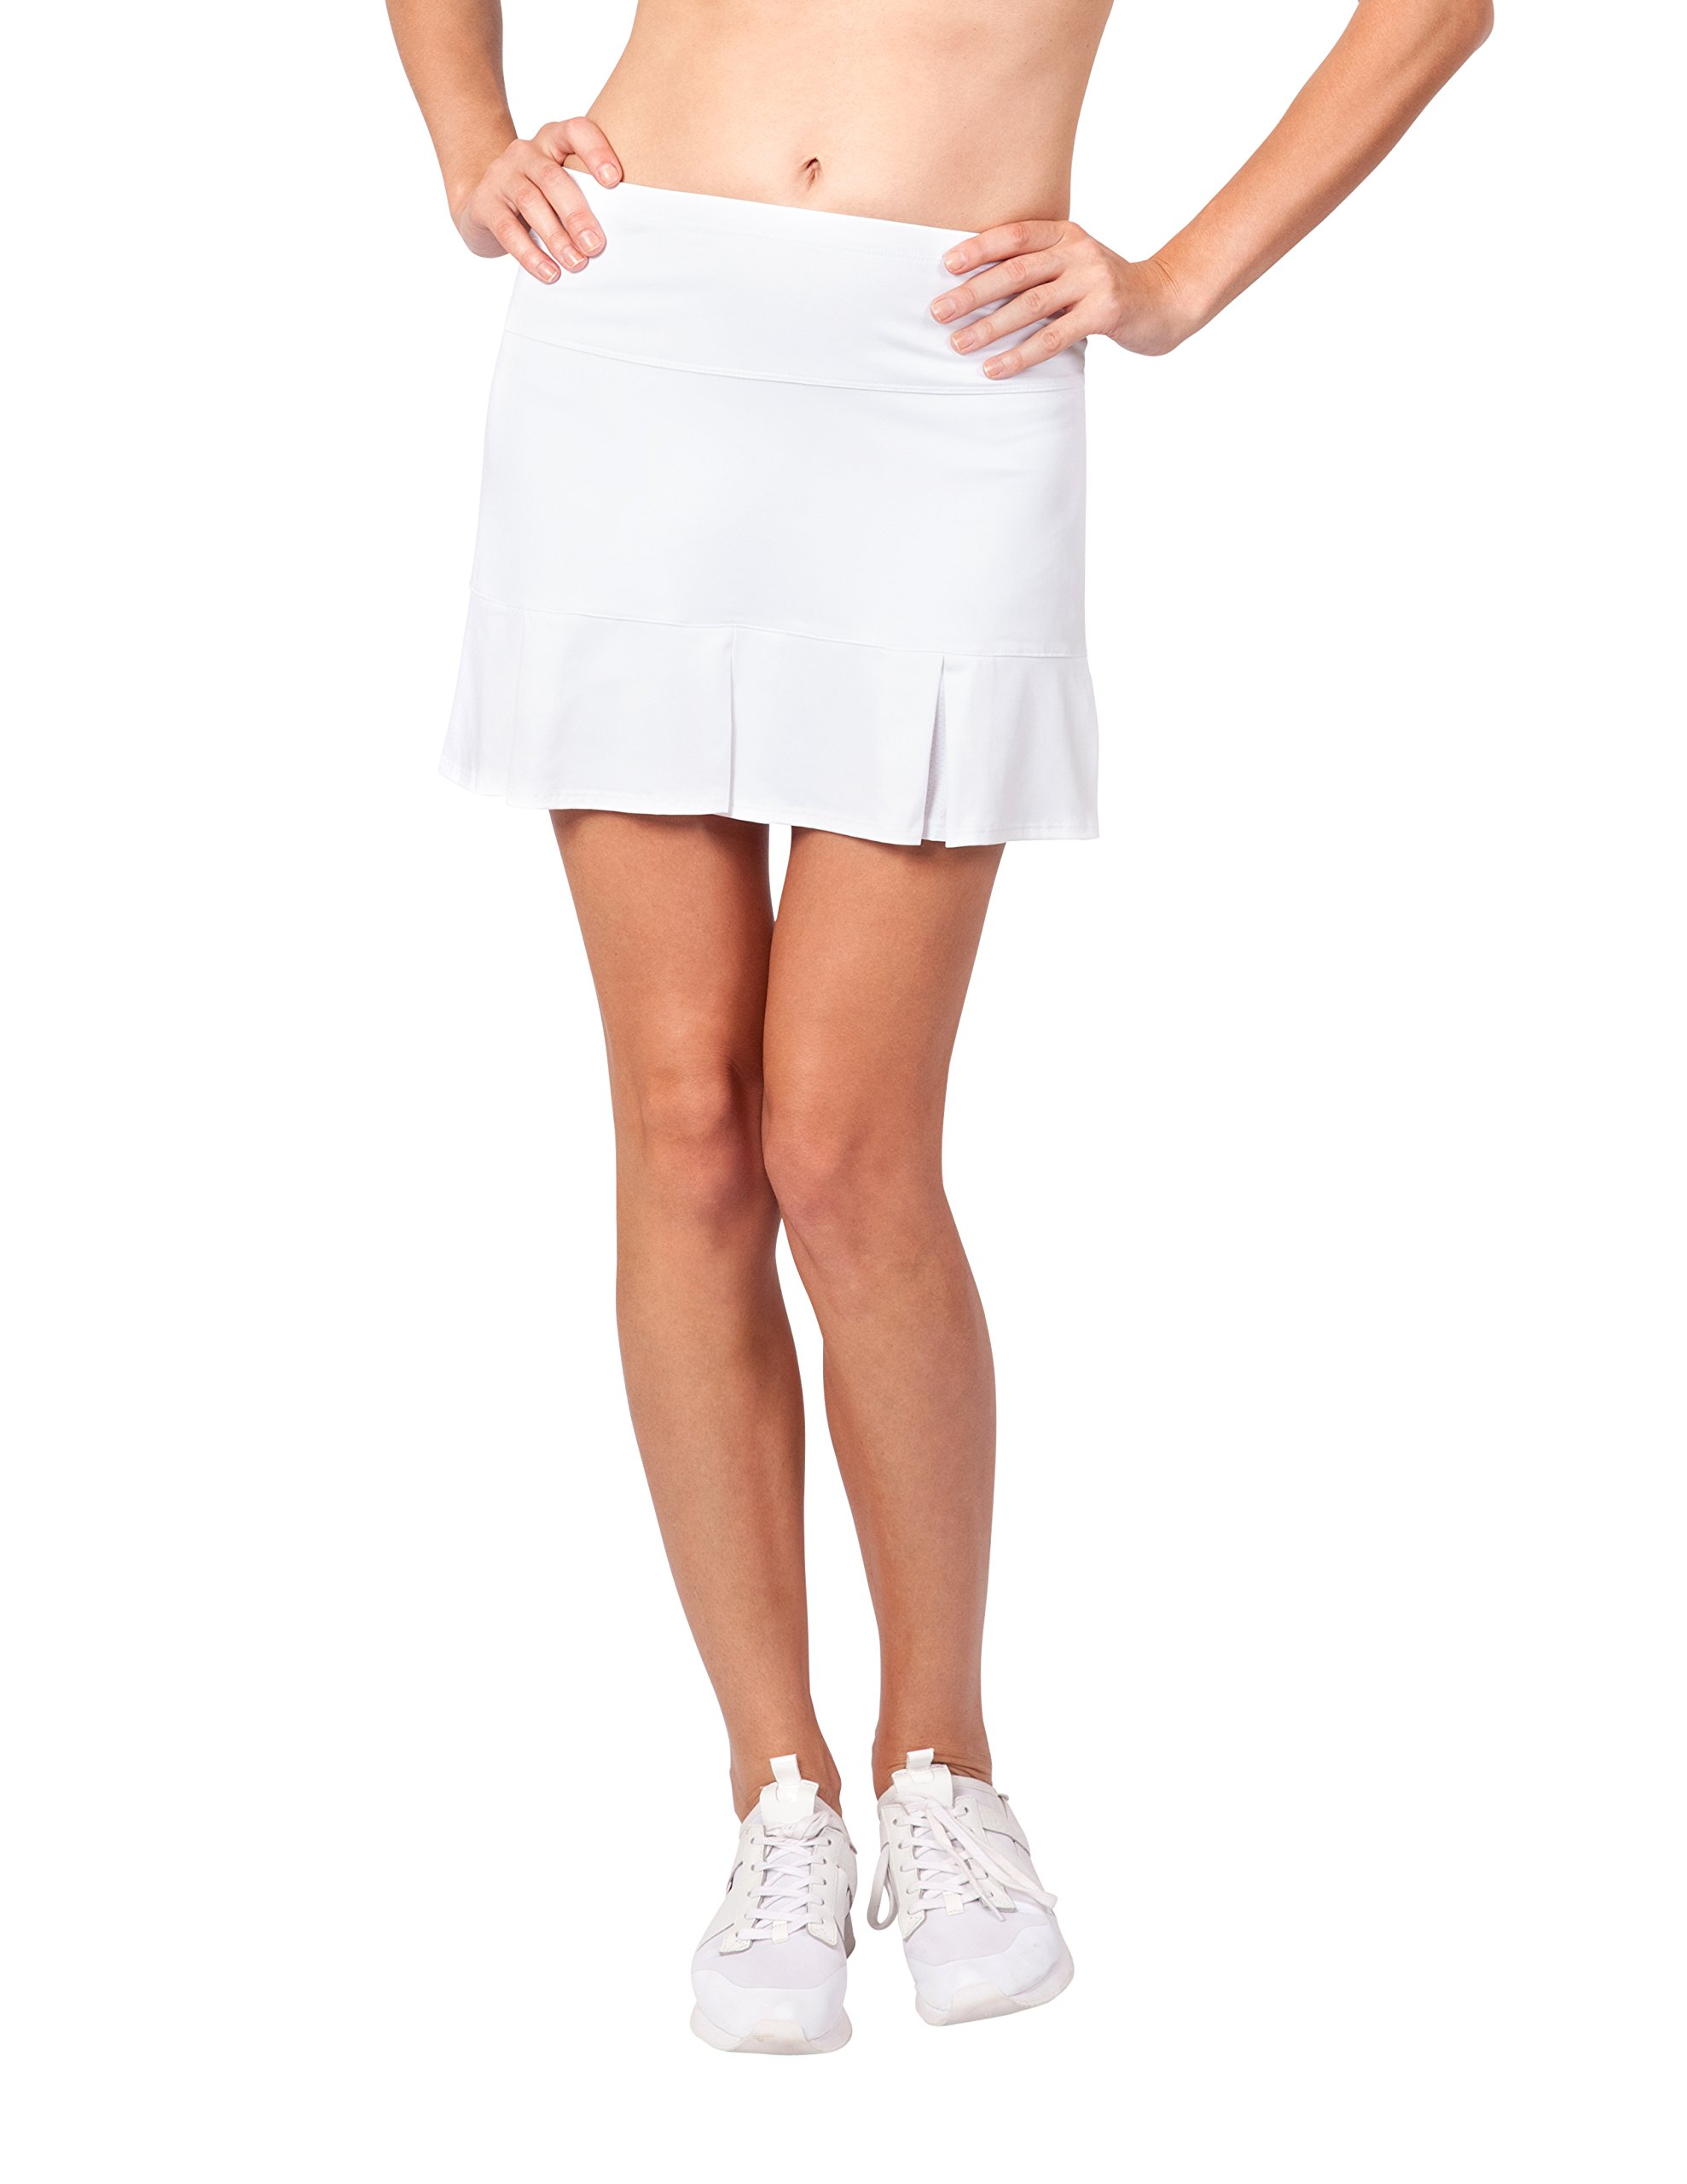 Tail Activewear Women's Doral 14.5 Length Skort Large White